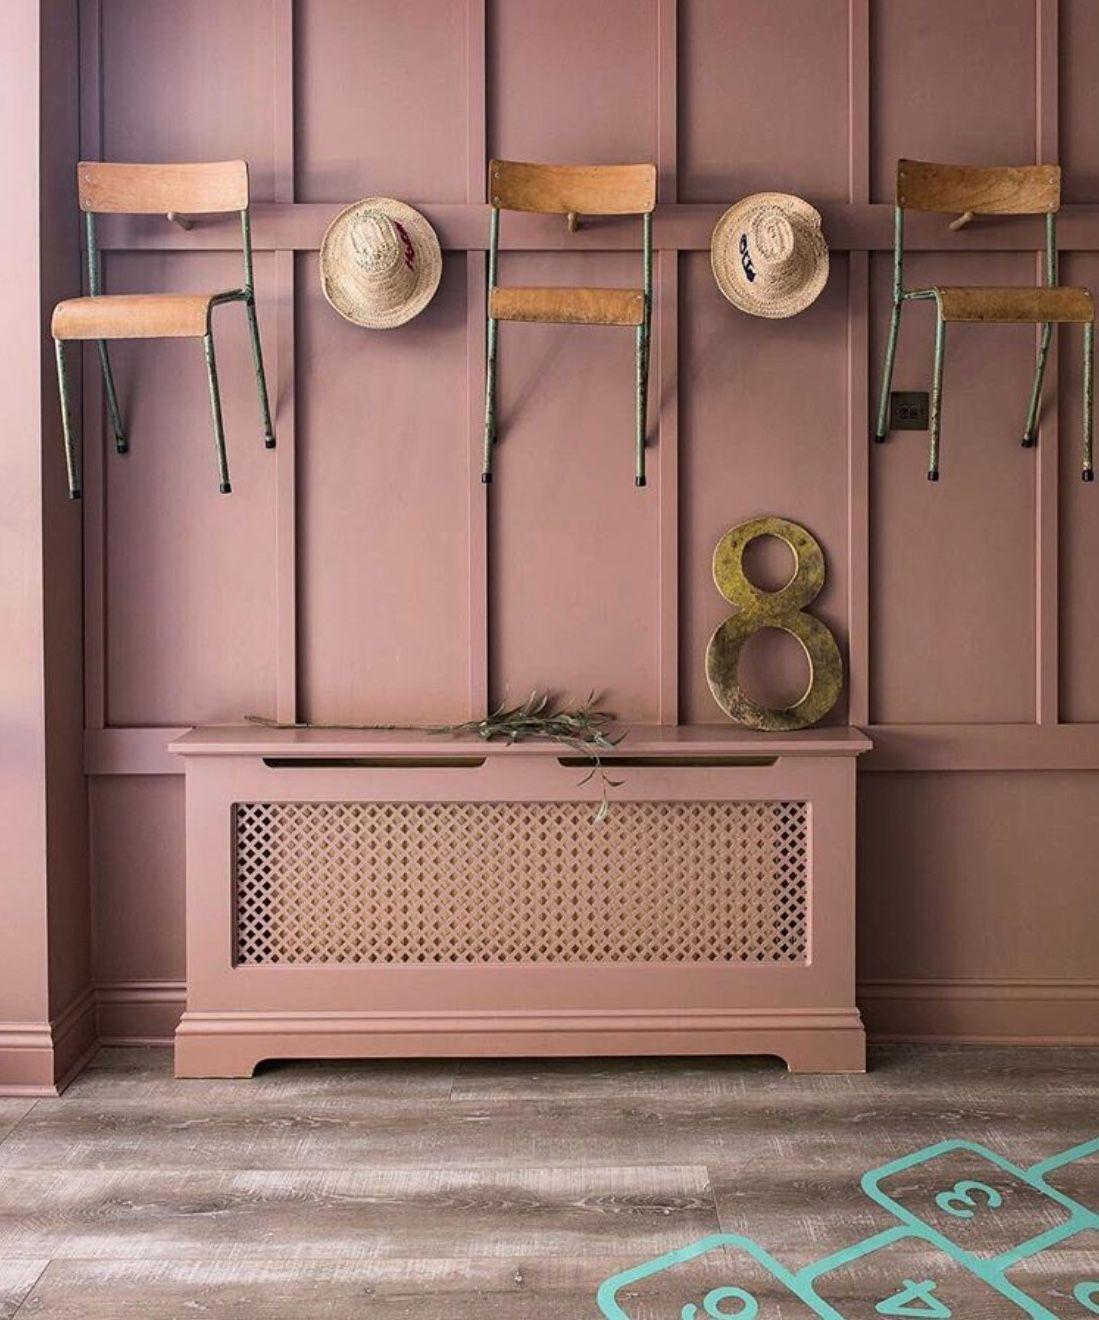 Farrow And Ball Sulking Room Pink Farrow And Ball Living Room Farrow And Ball Bedroom Hallway Colours